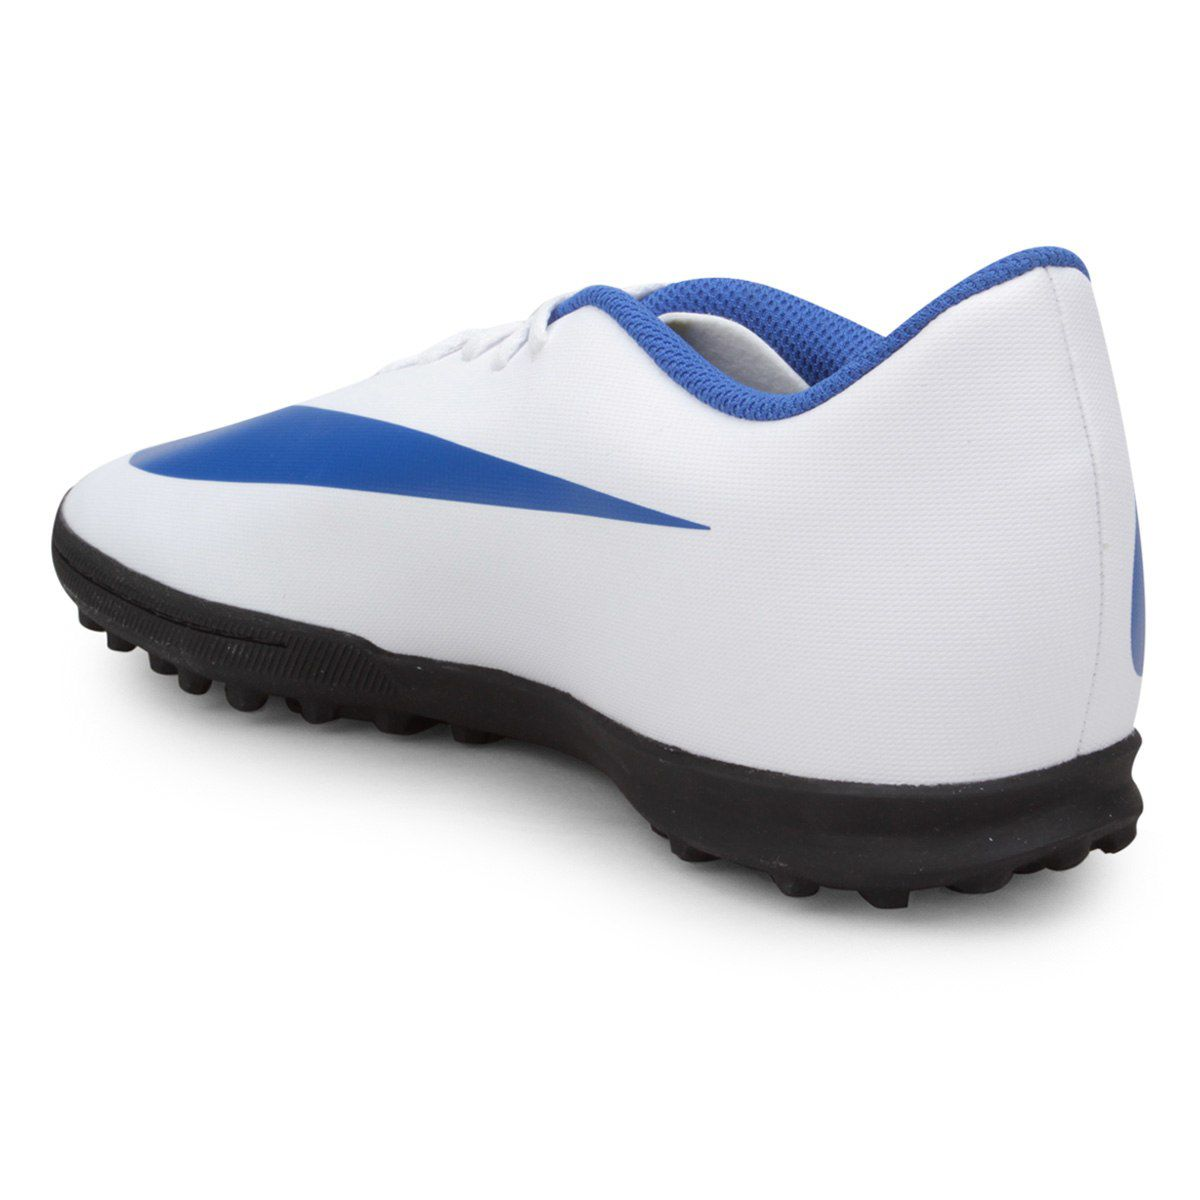 4f8b05dae4e93 Chuteira Society Nike Bravata Ii Azul Branco - Titanes Esportes